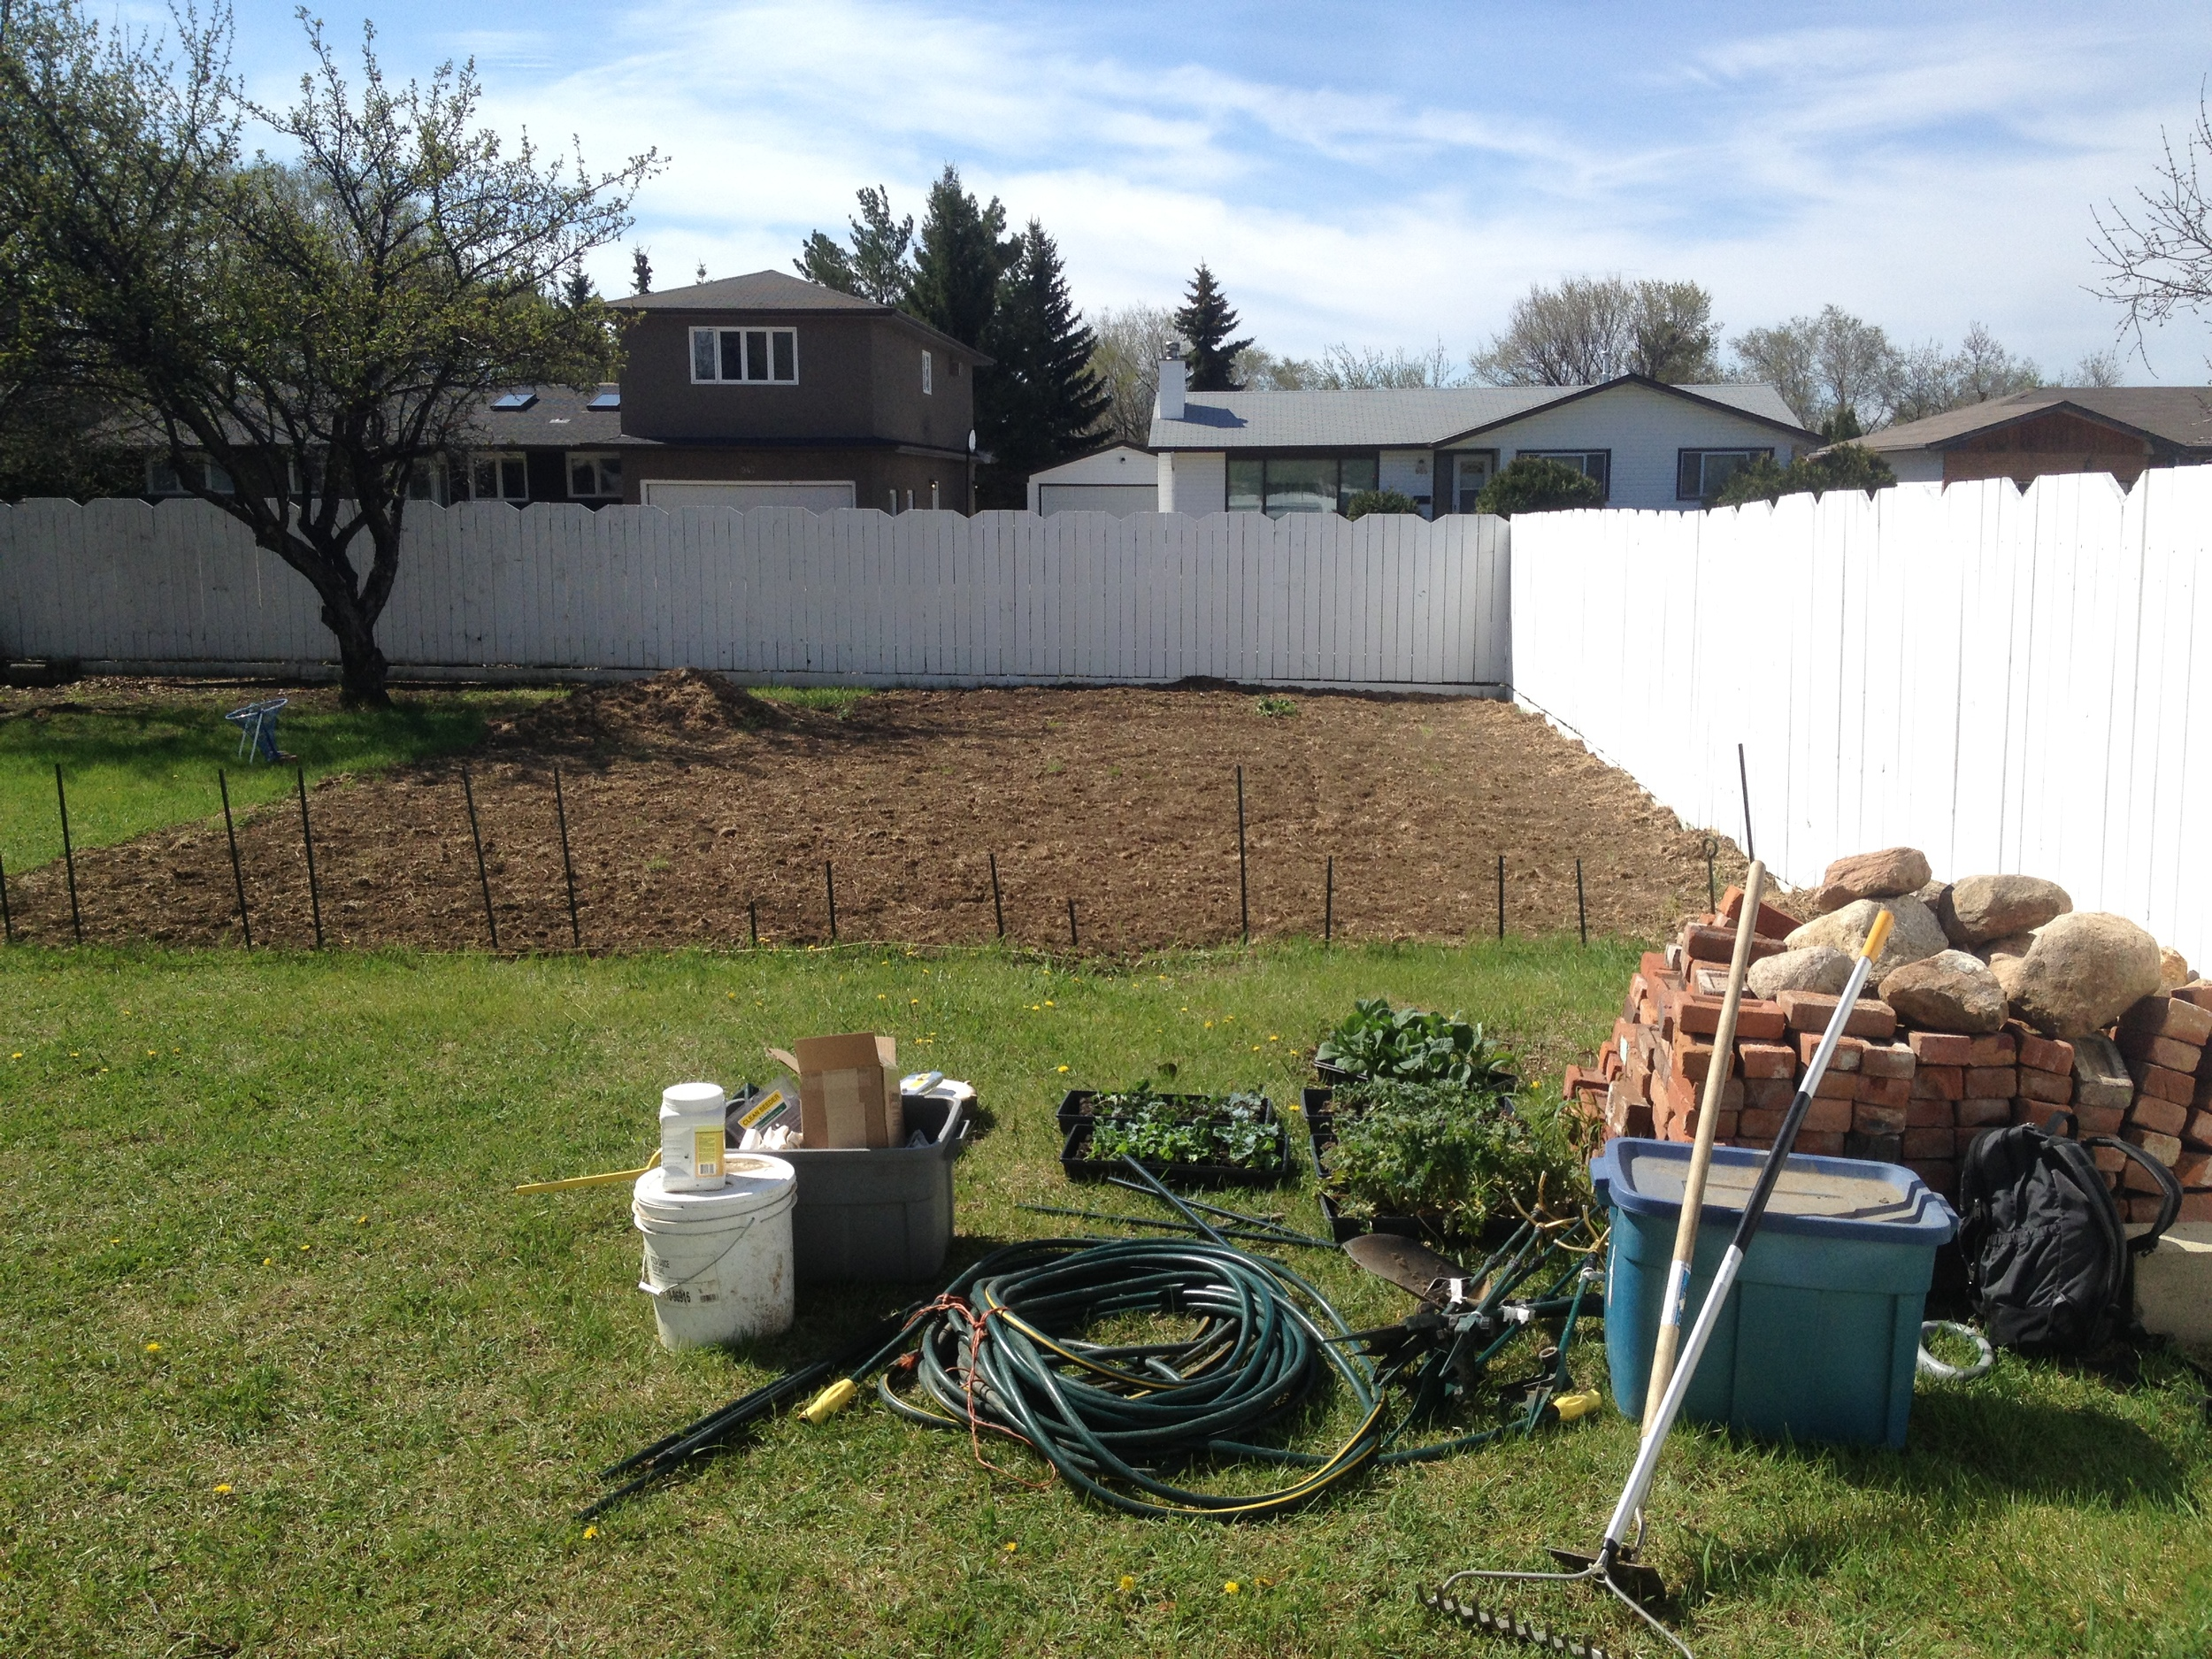 sask-urban-farming.JPG